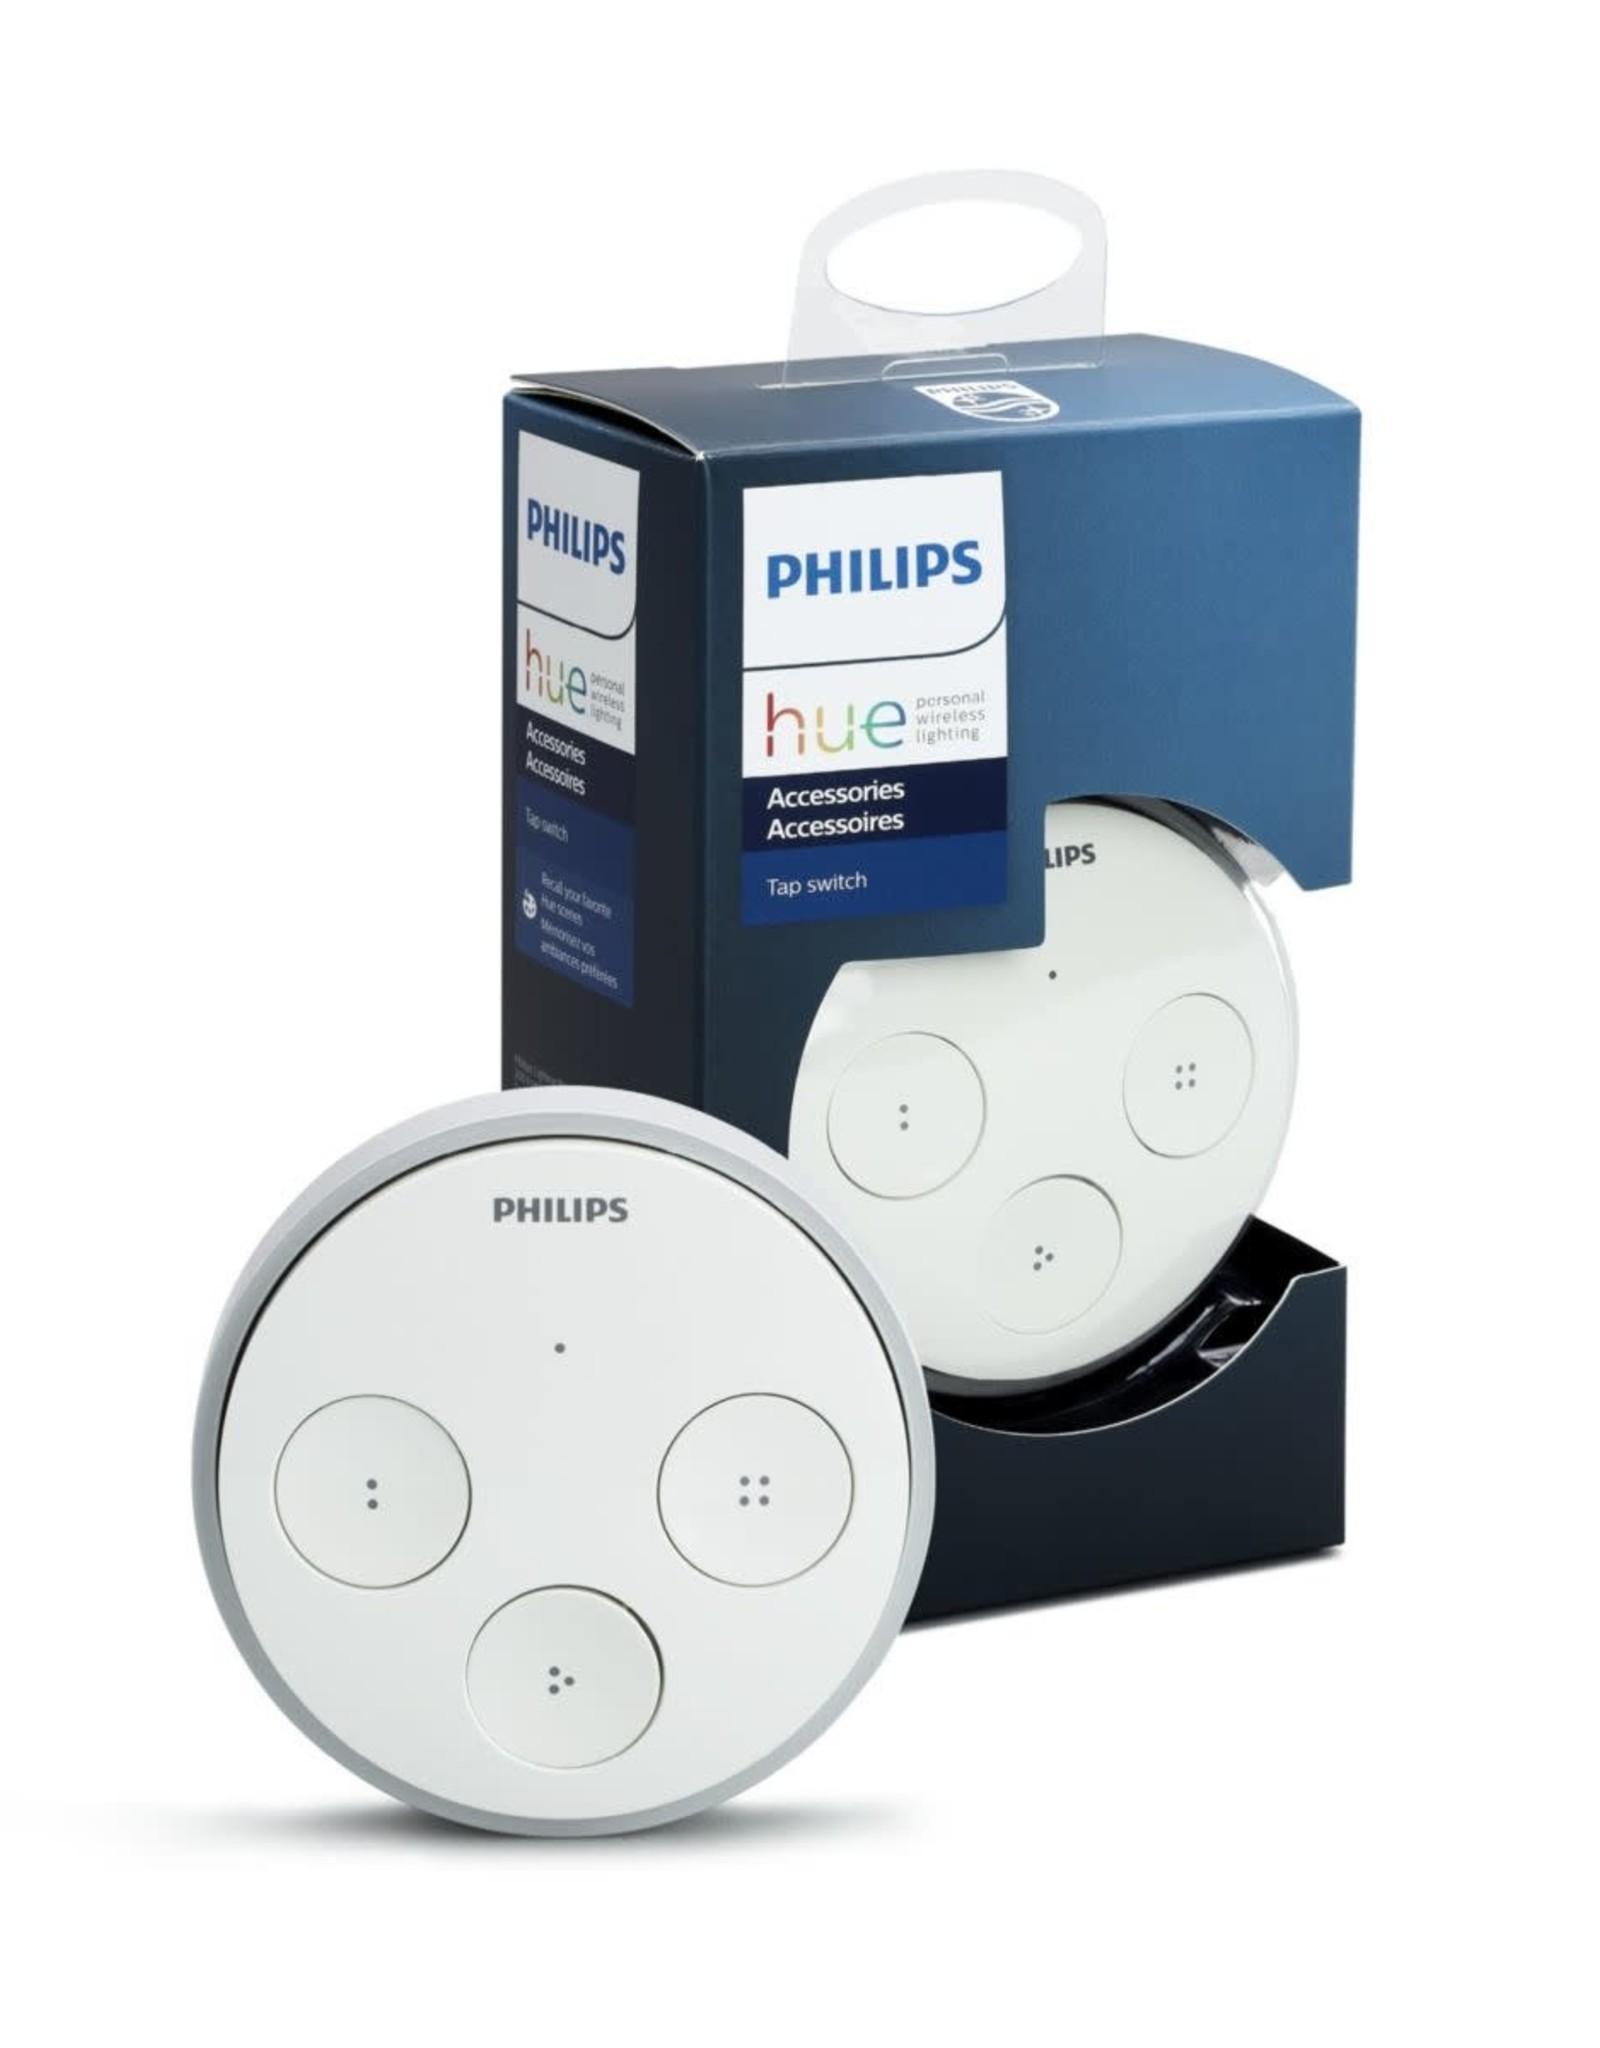 Philips Hue HUETAP